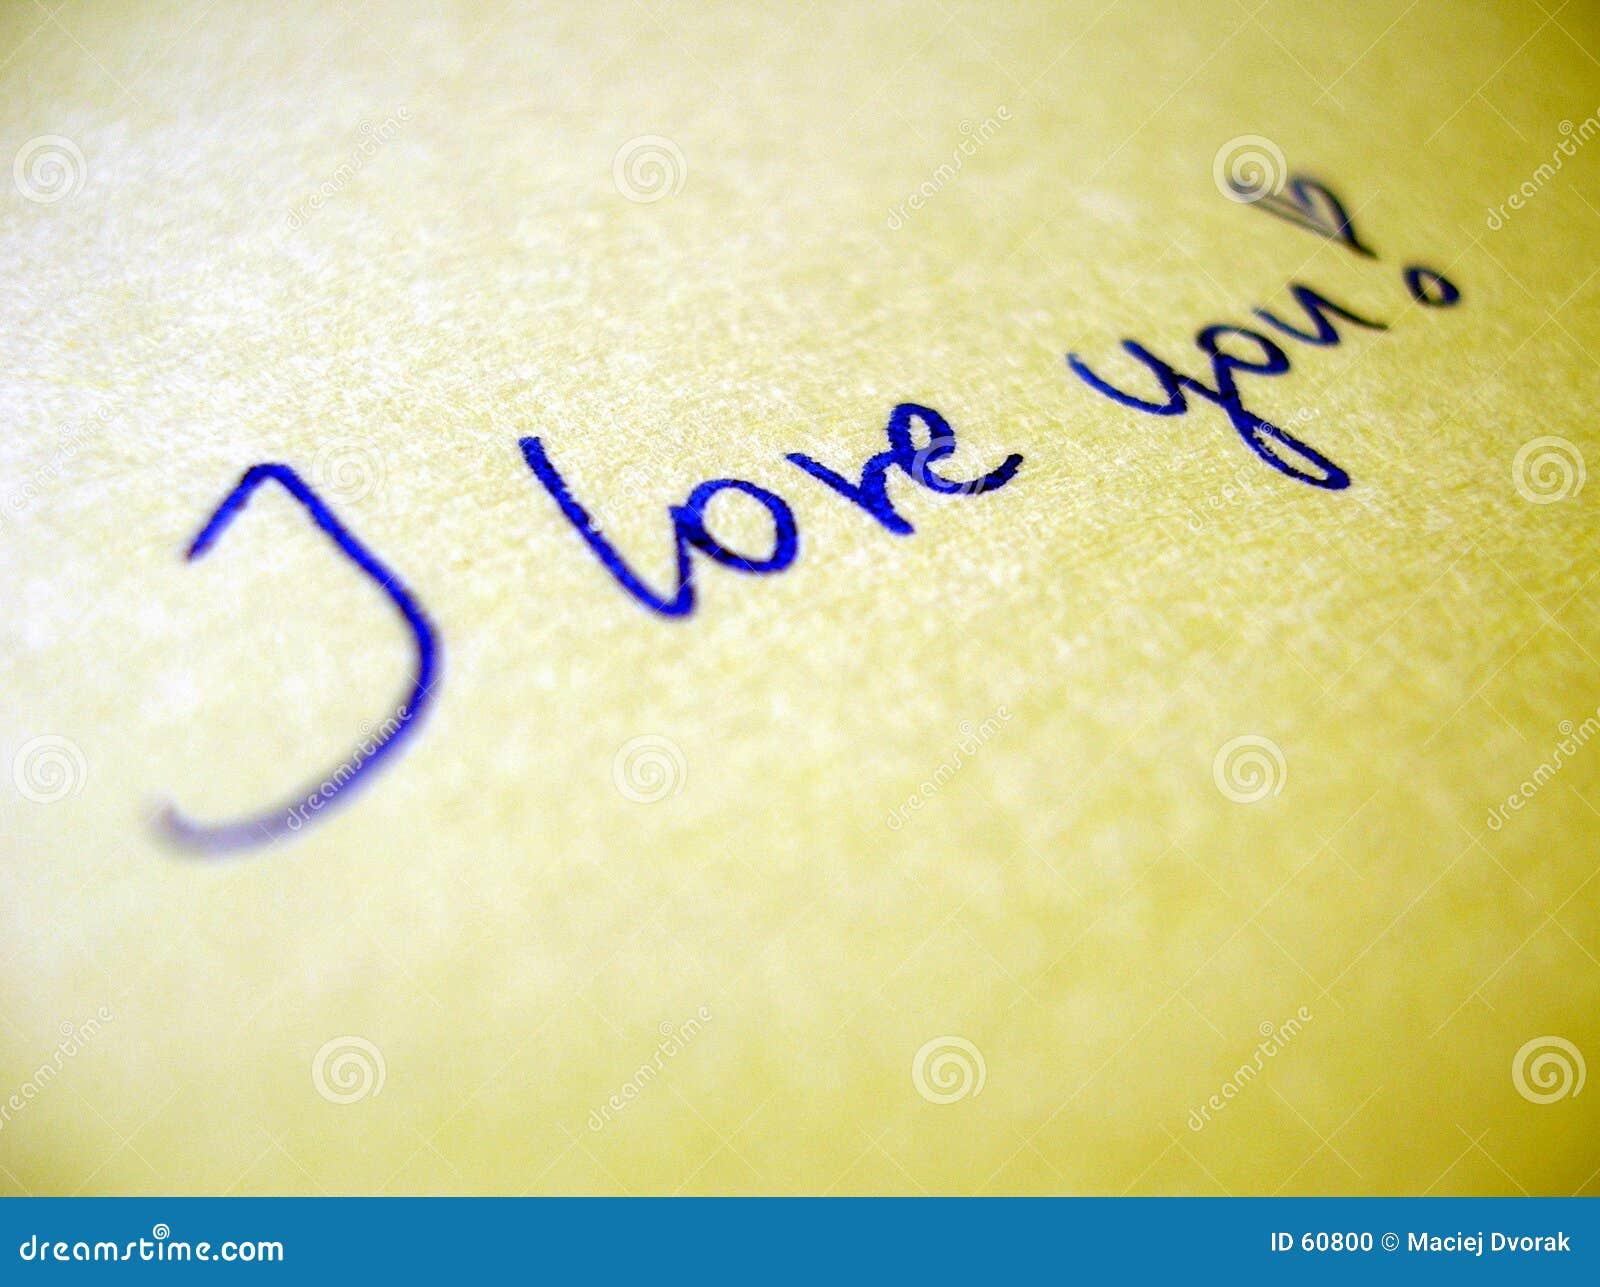 Download σας αγαπώ στοκ εικόνες. εικόνα από ballards, έννοια, amorously - 60800